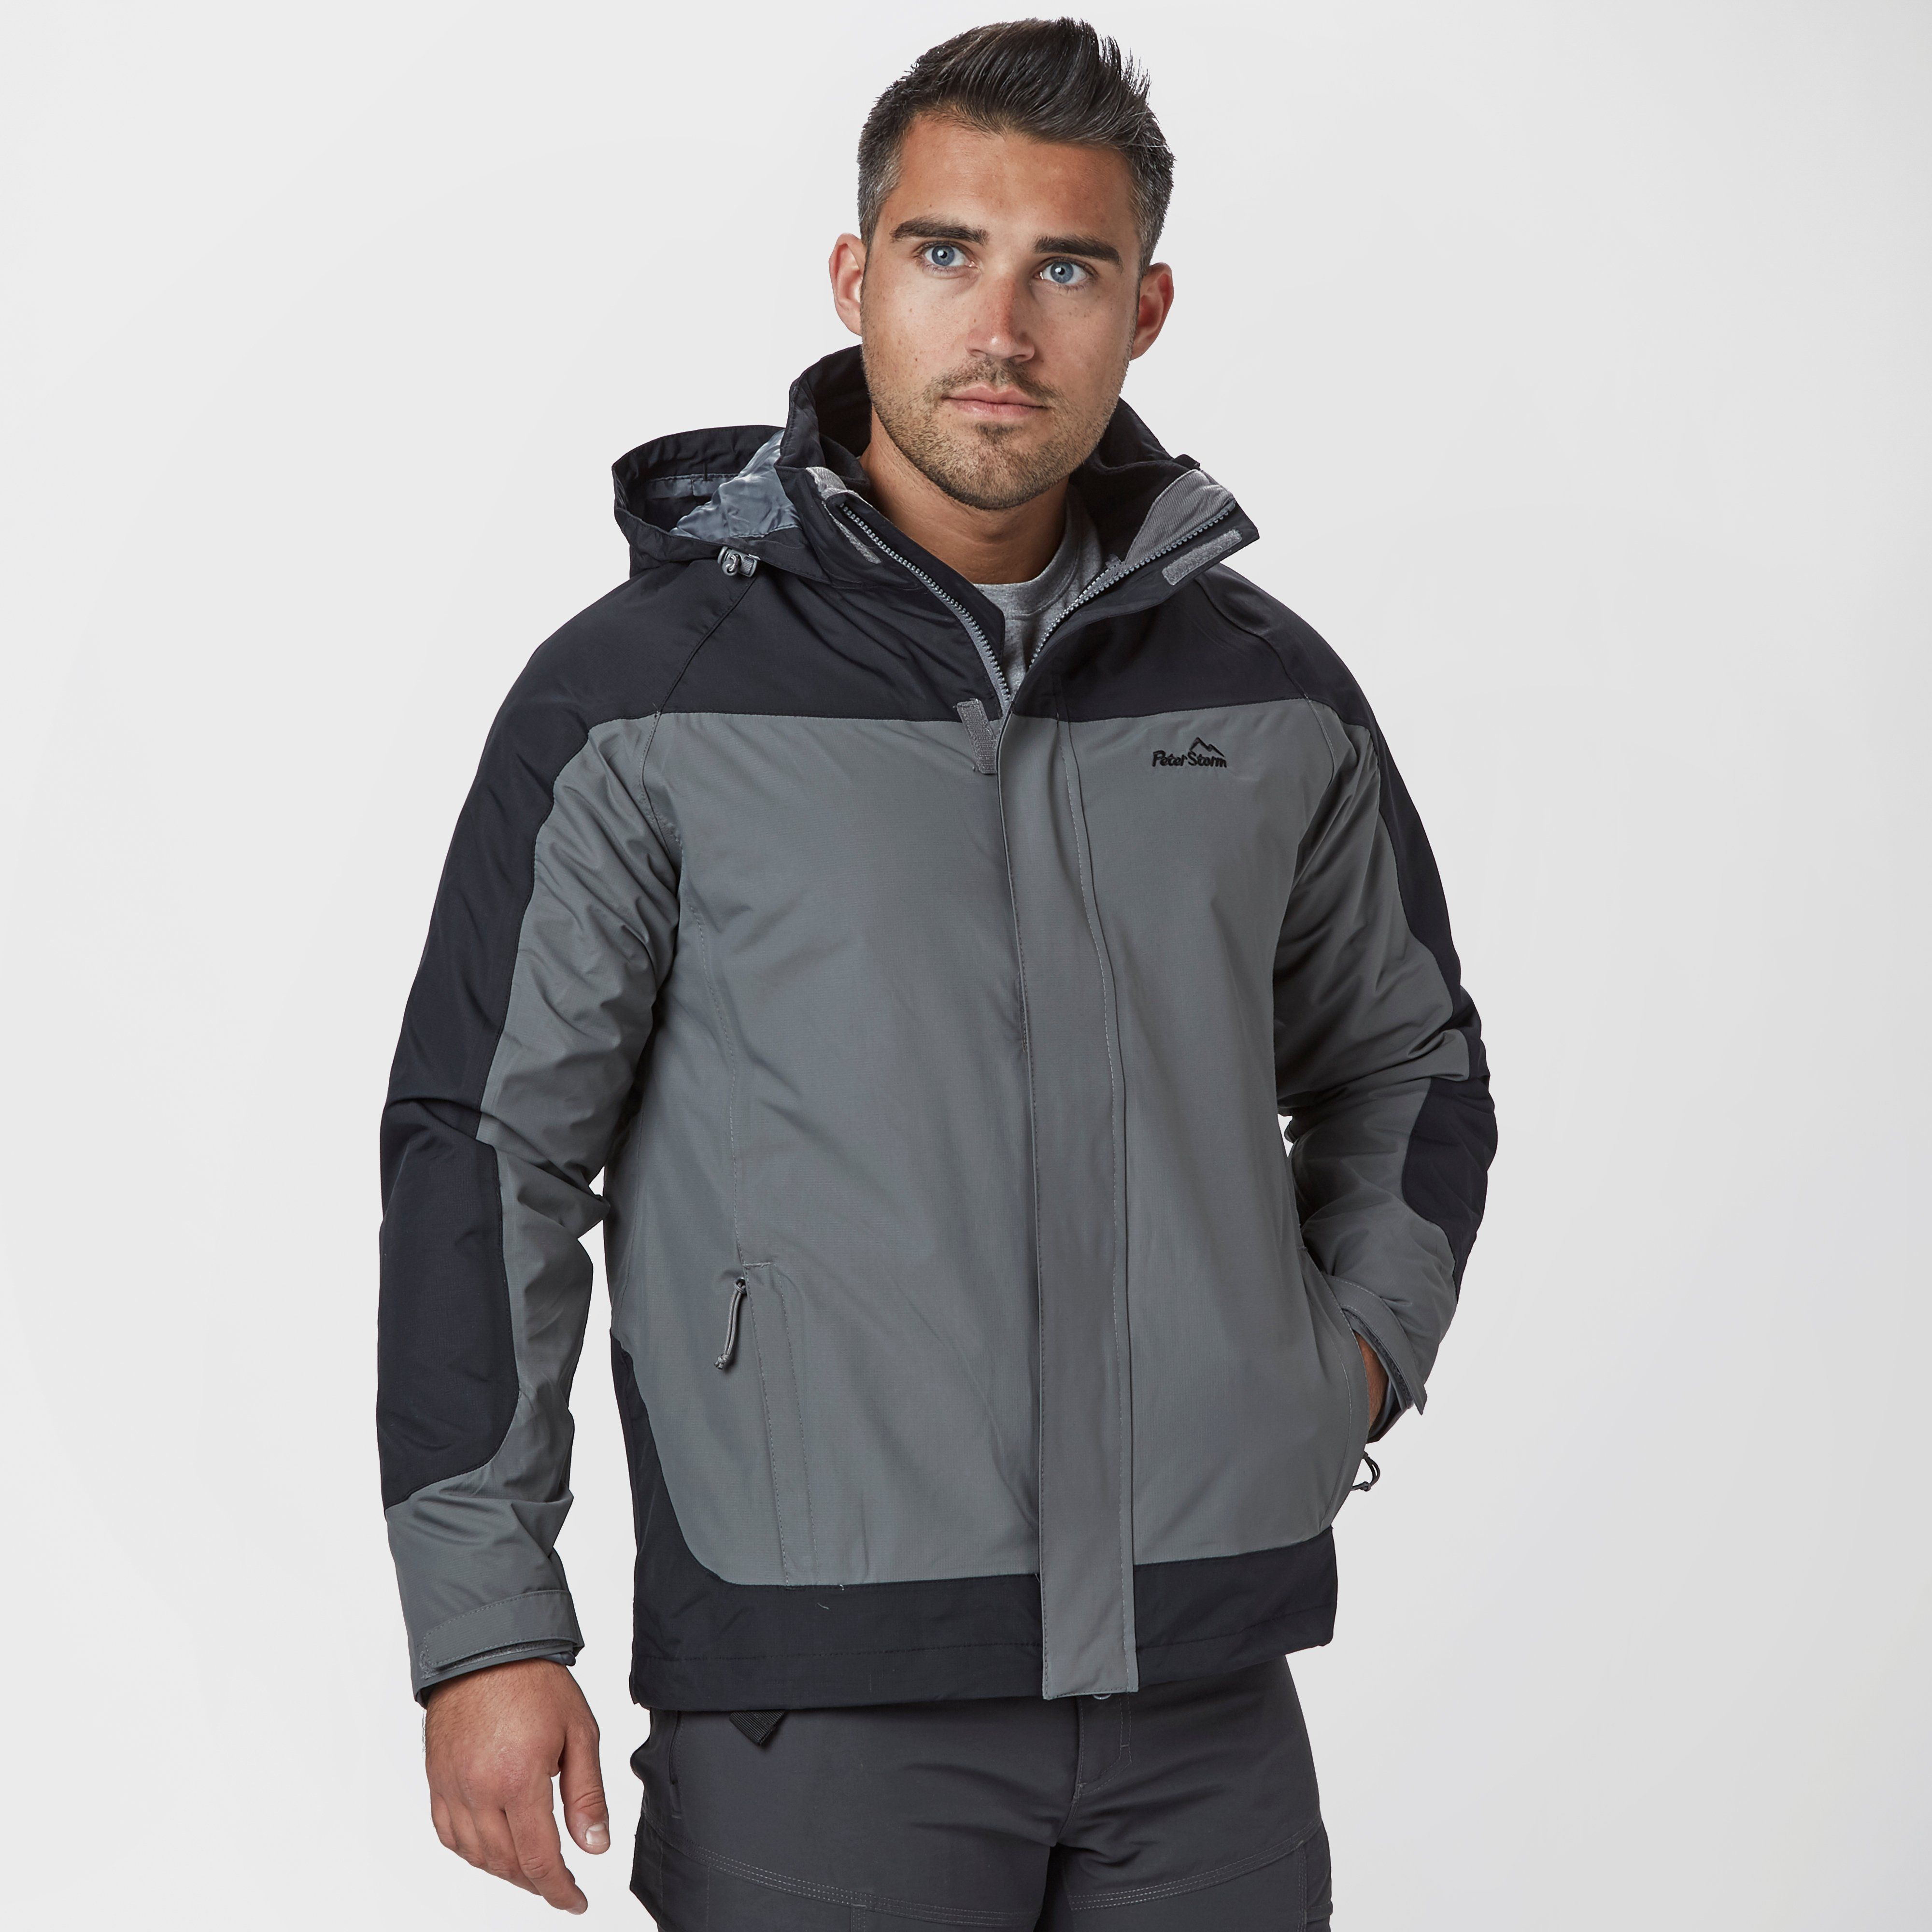 PETER STORM Men's Lakeside 3-in-1 Jacket